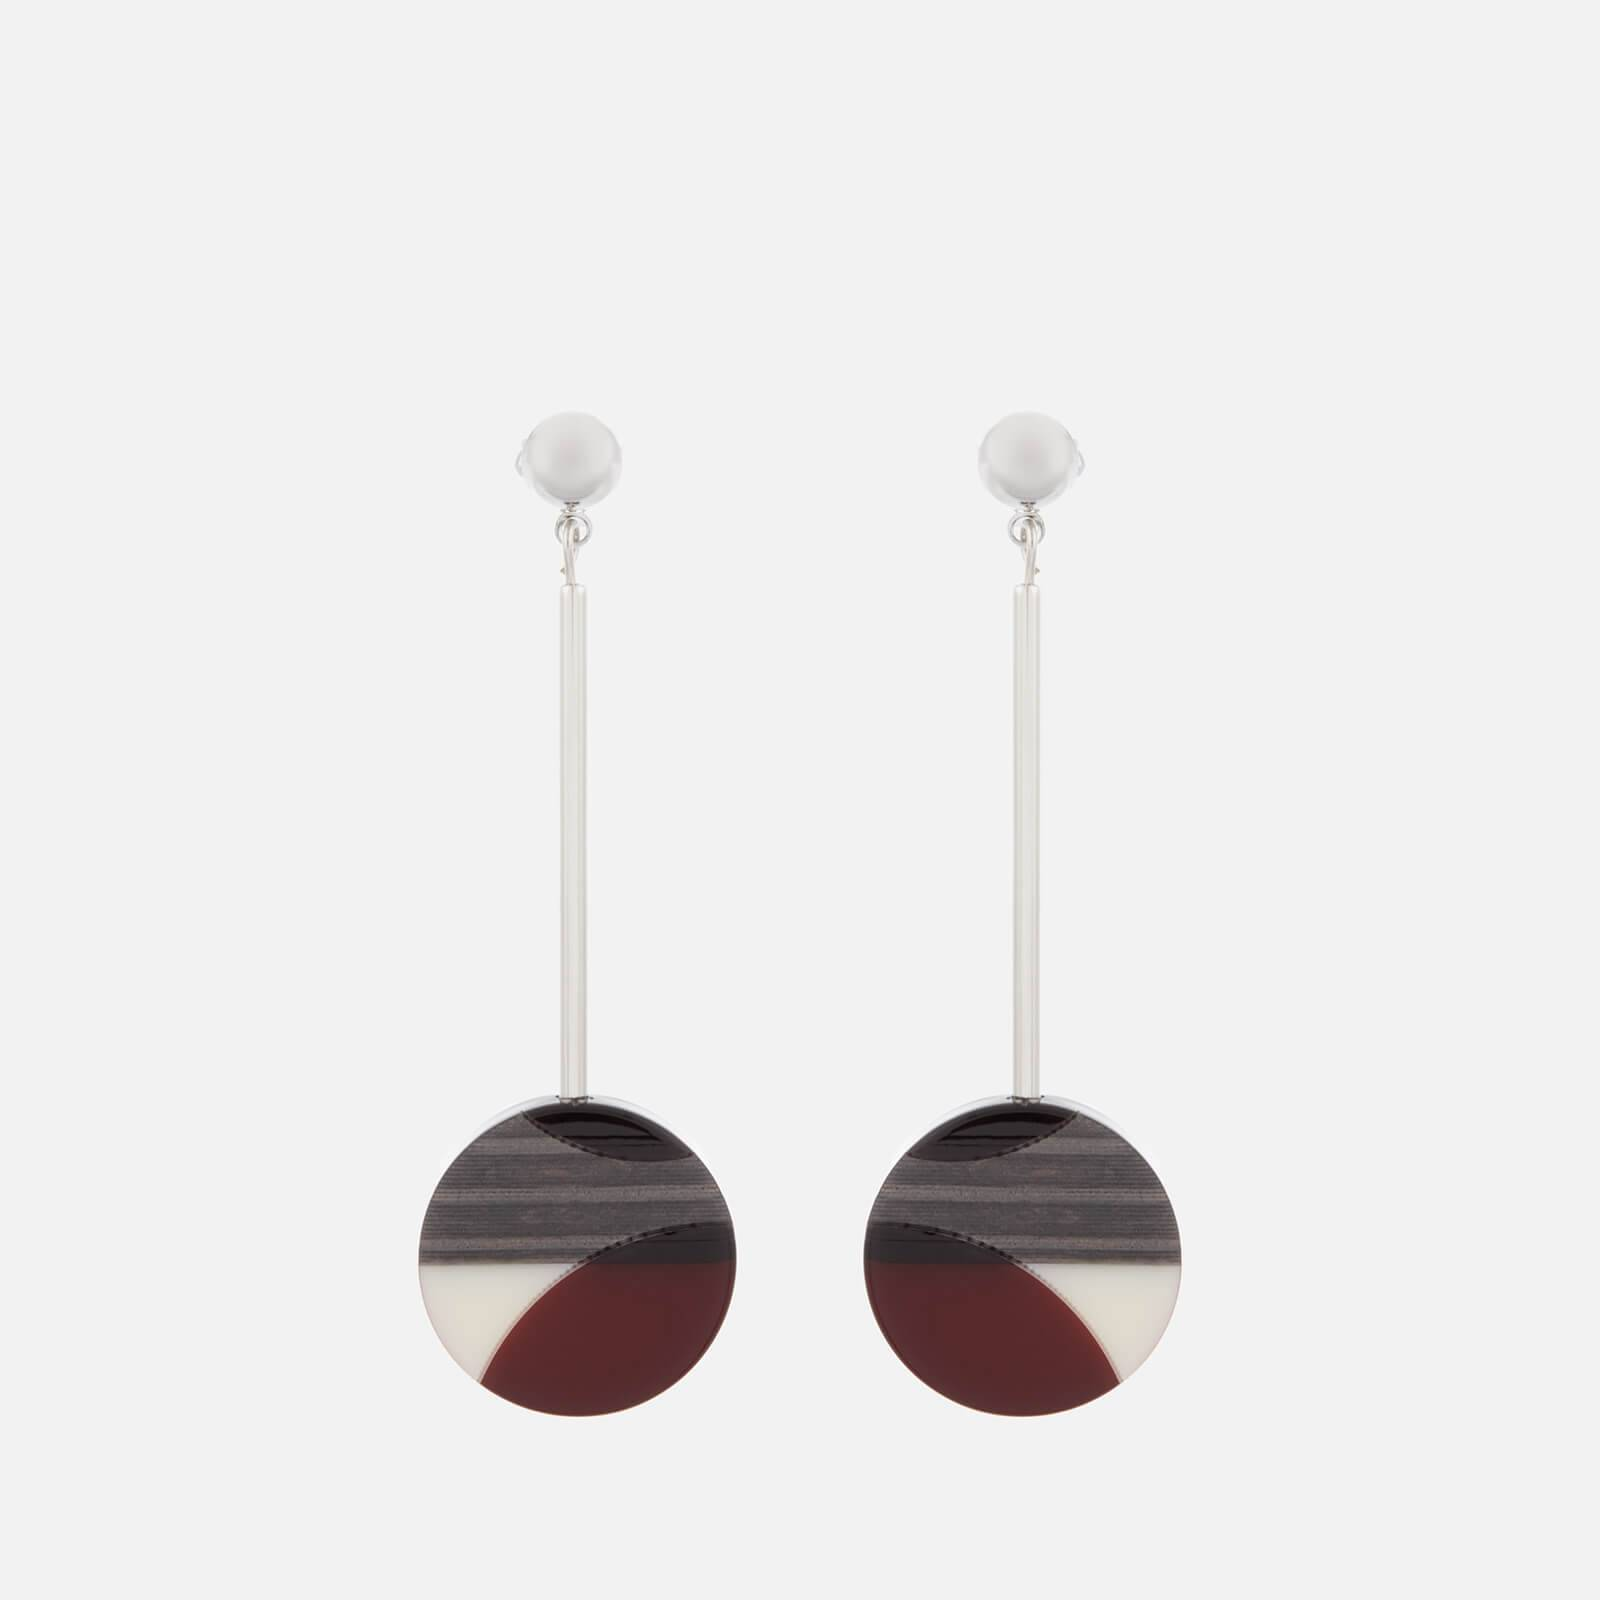 Whistles Women's Geometric Drop Resin Earrings - Burgundy